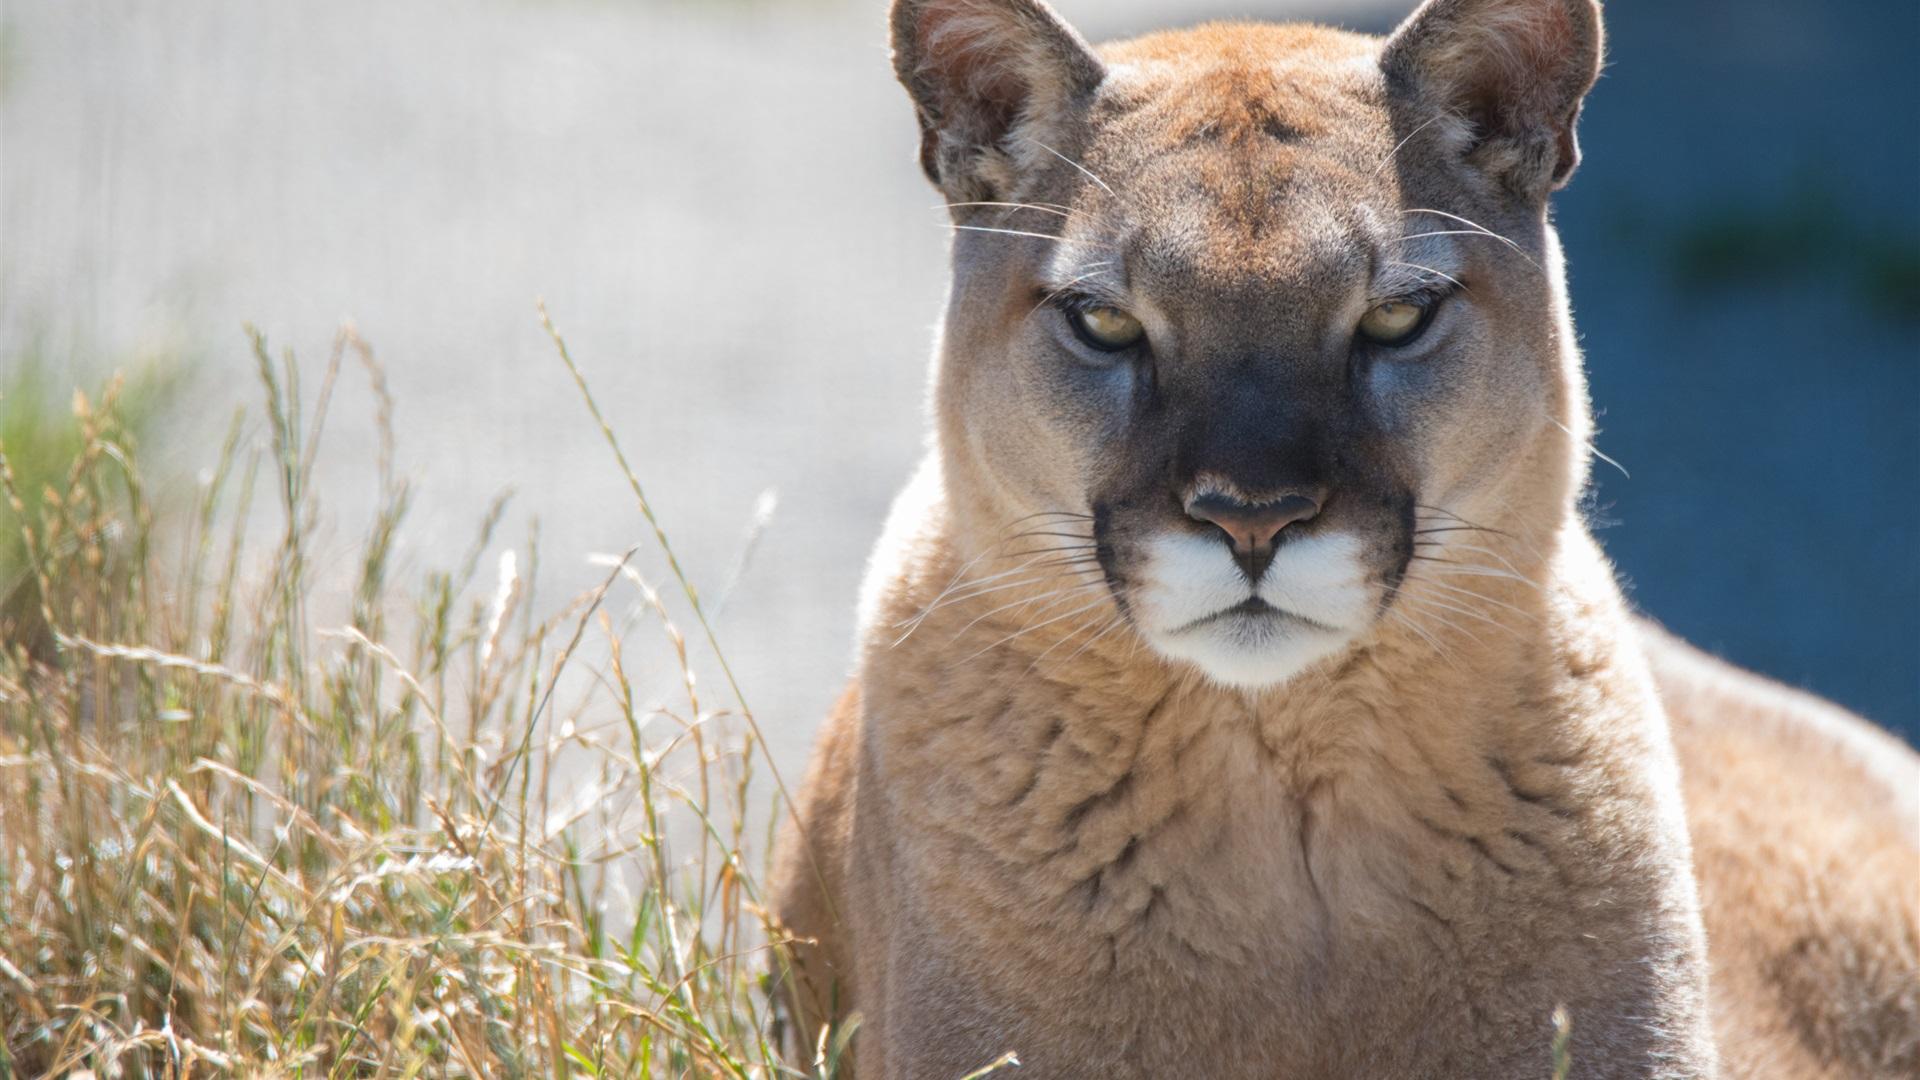 Wallpaper Mountain Lion Front View Cougar 3840x2160 Uhd 4k